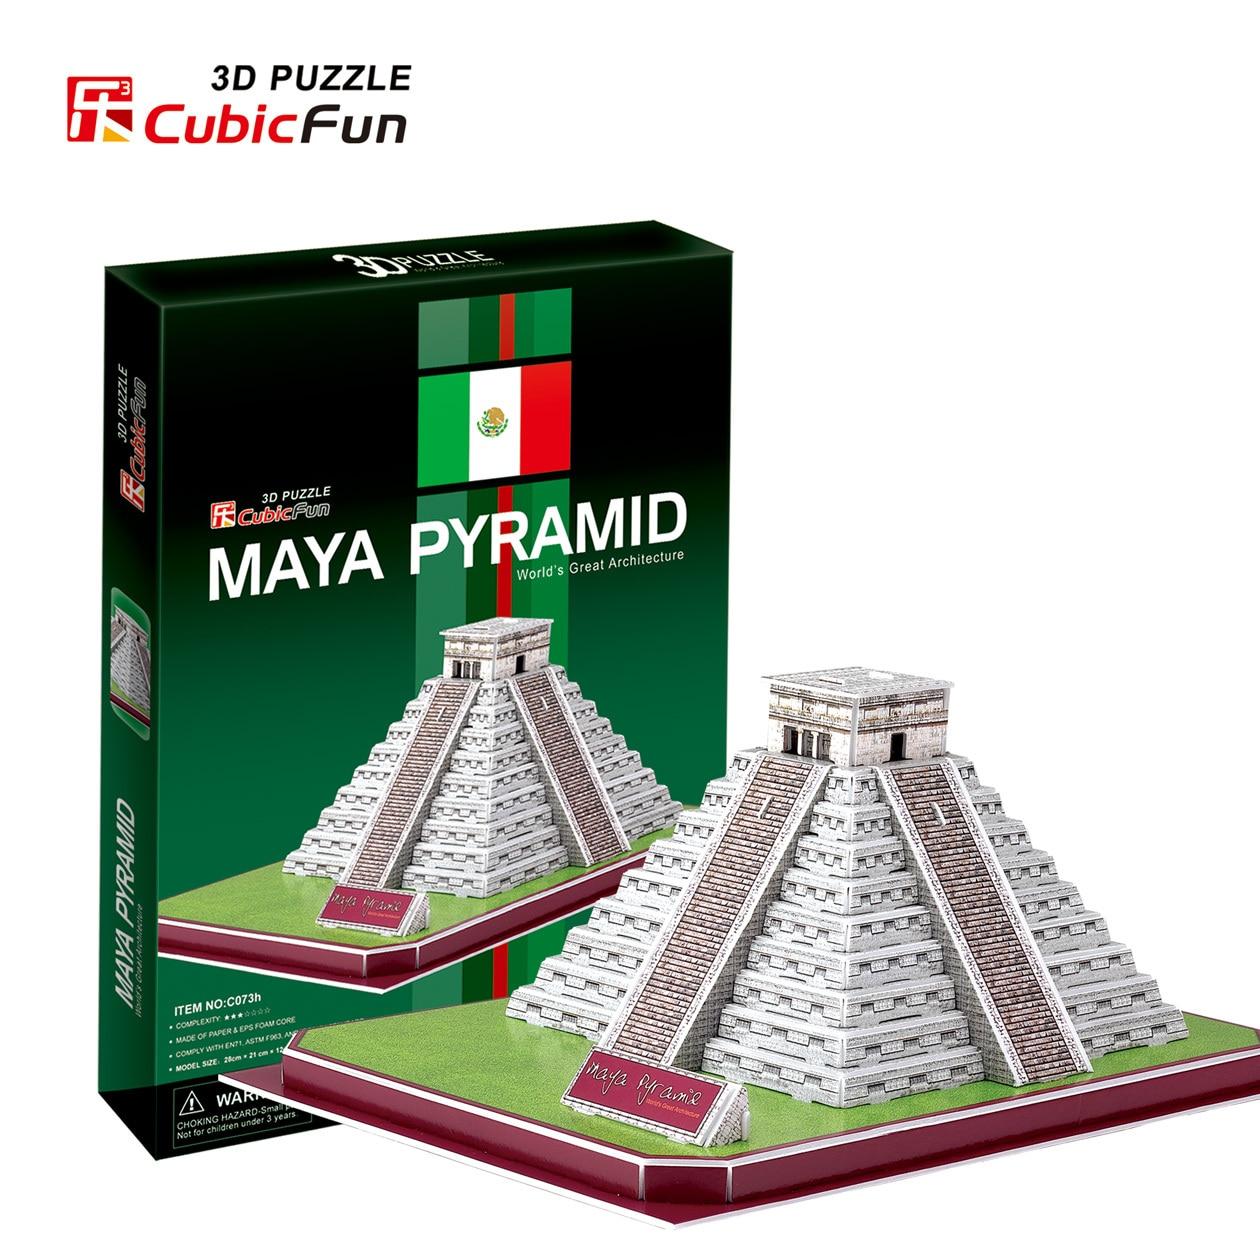 3D puzzle toy CubicFun paper model jigsaw game mini Maya Pyramid baby gift 1pc